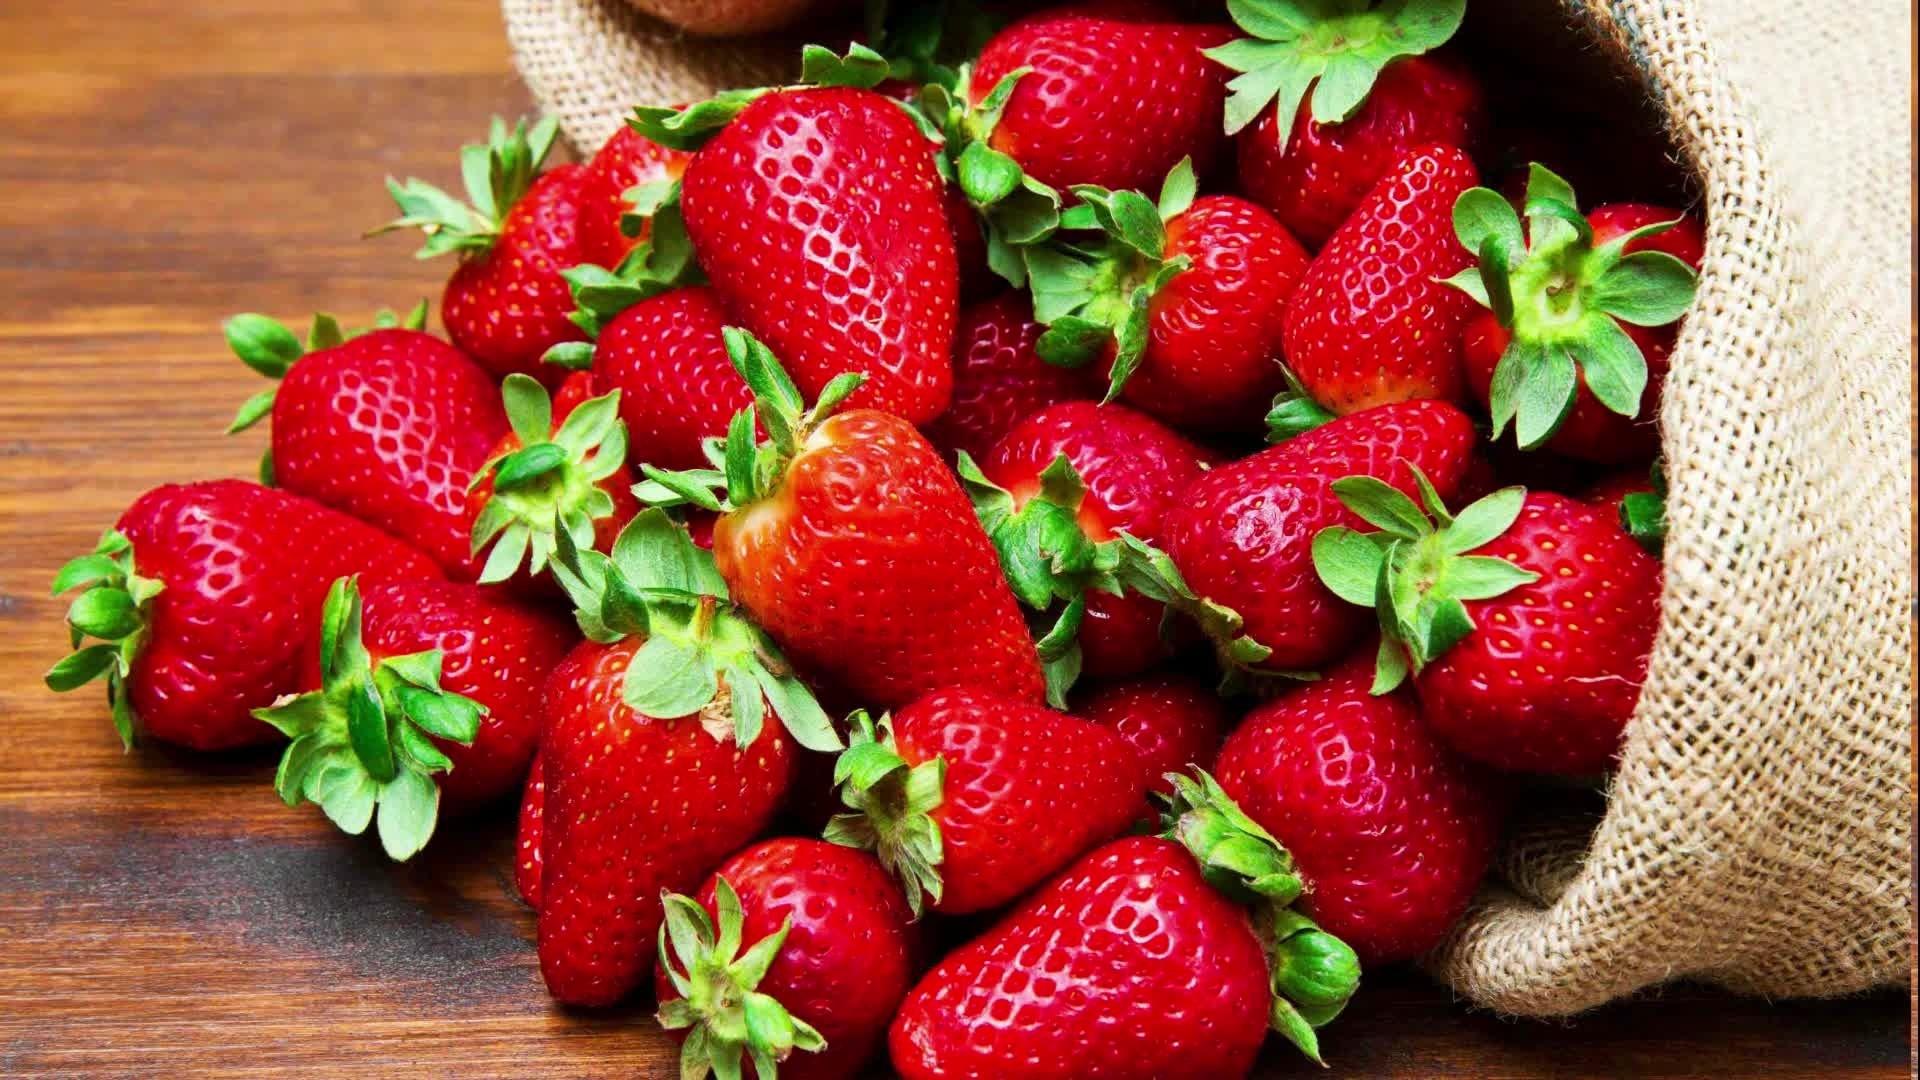 Strawberry Wallpaper